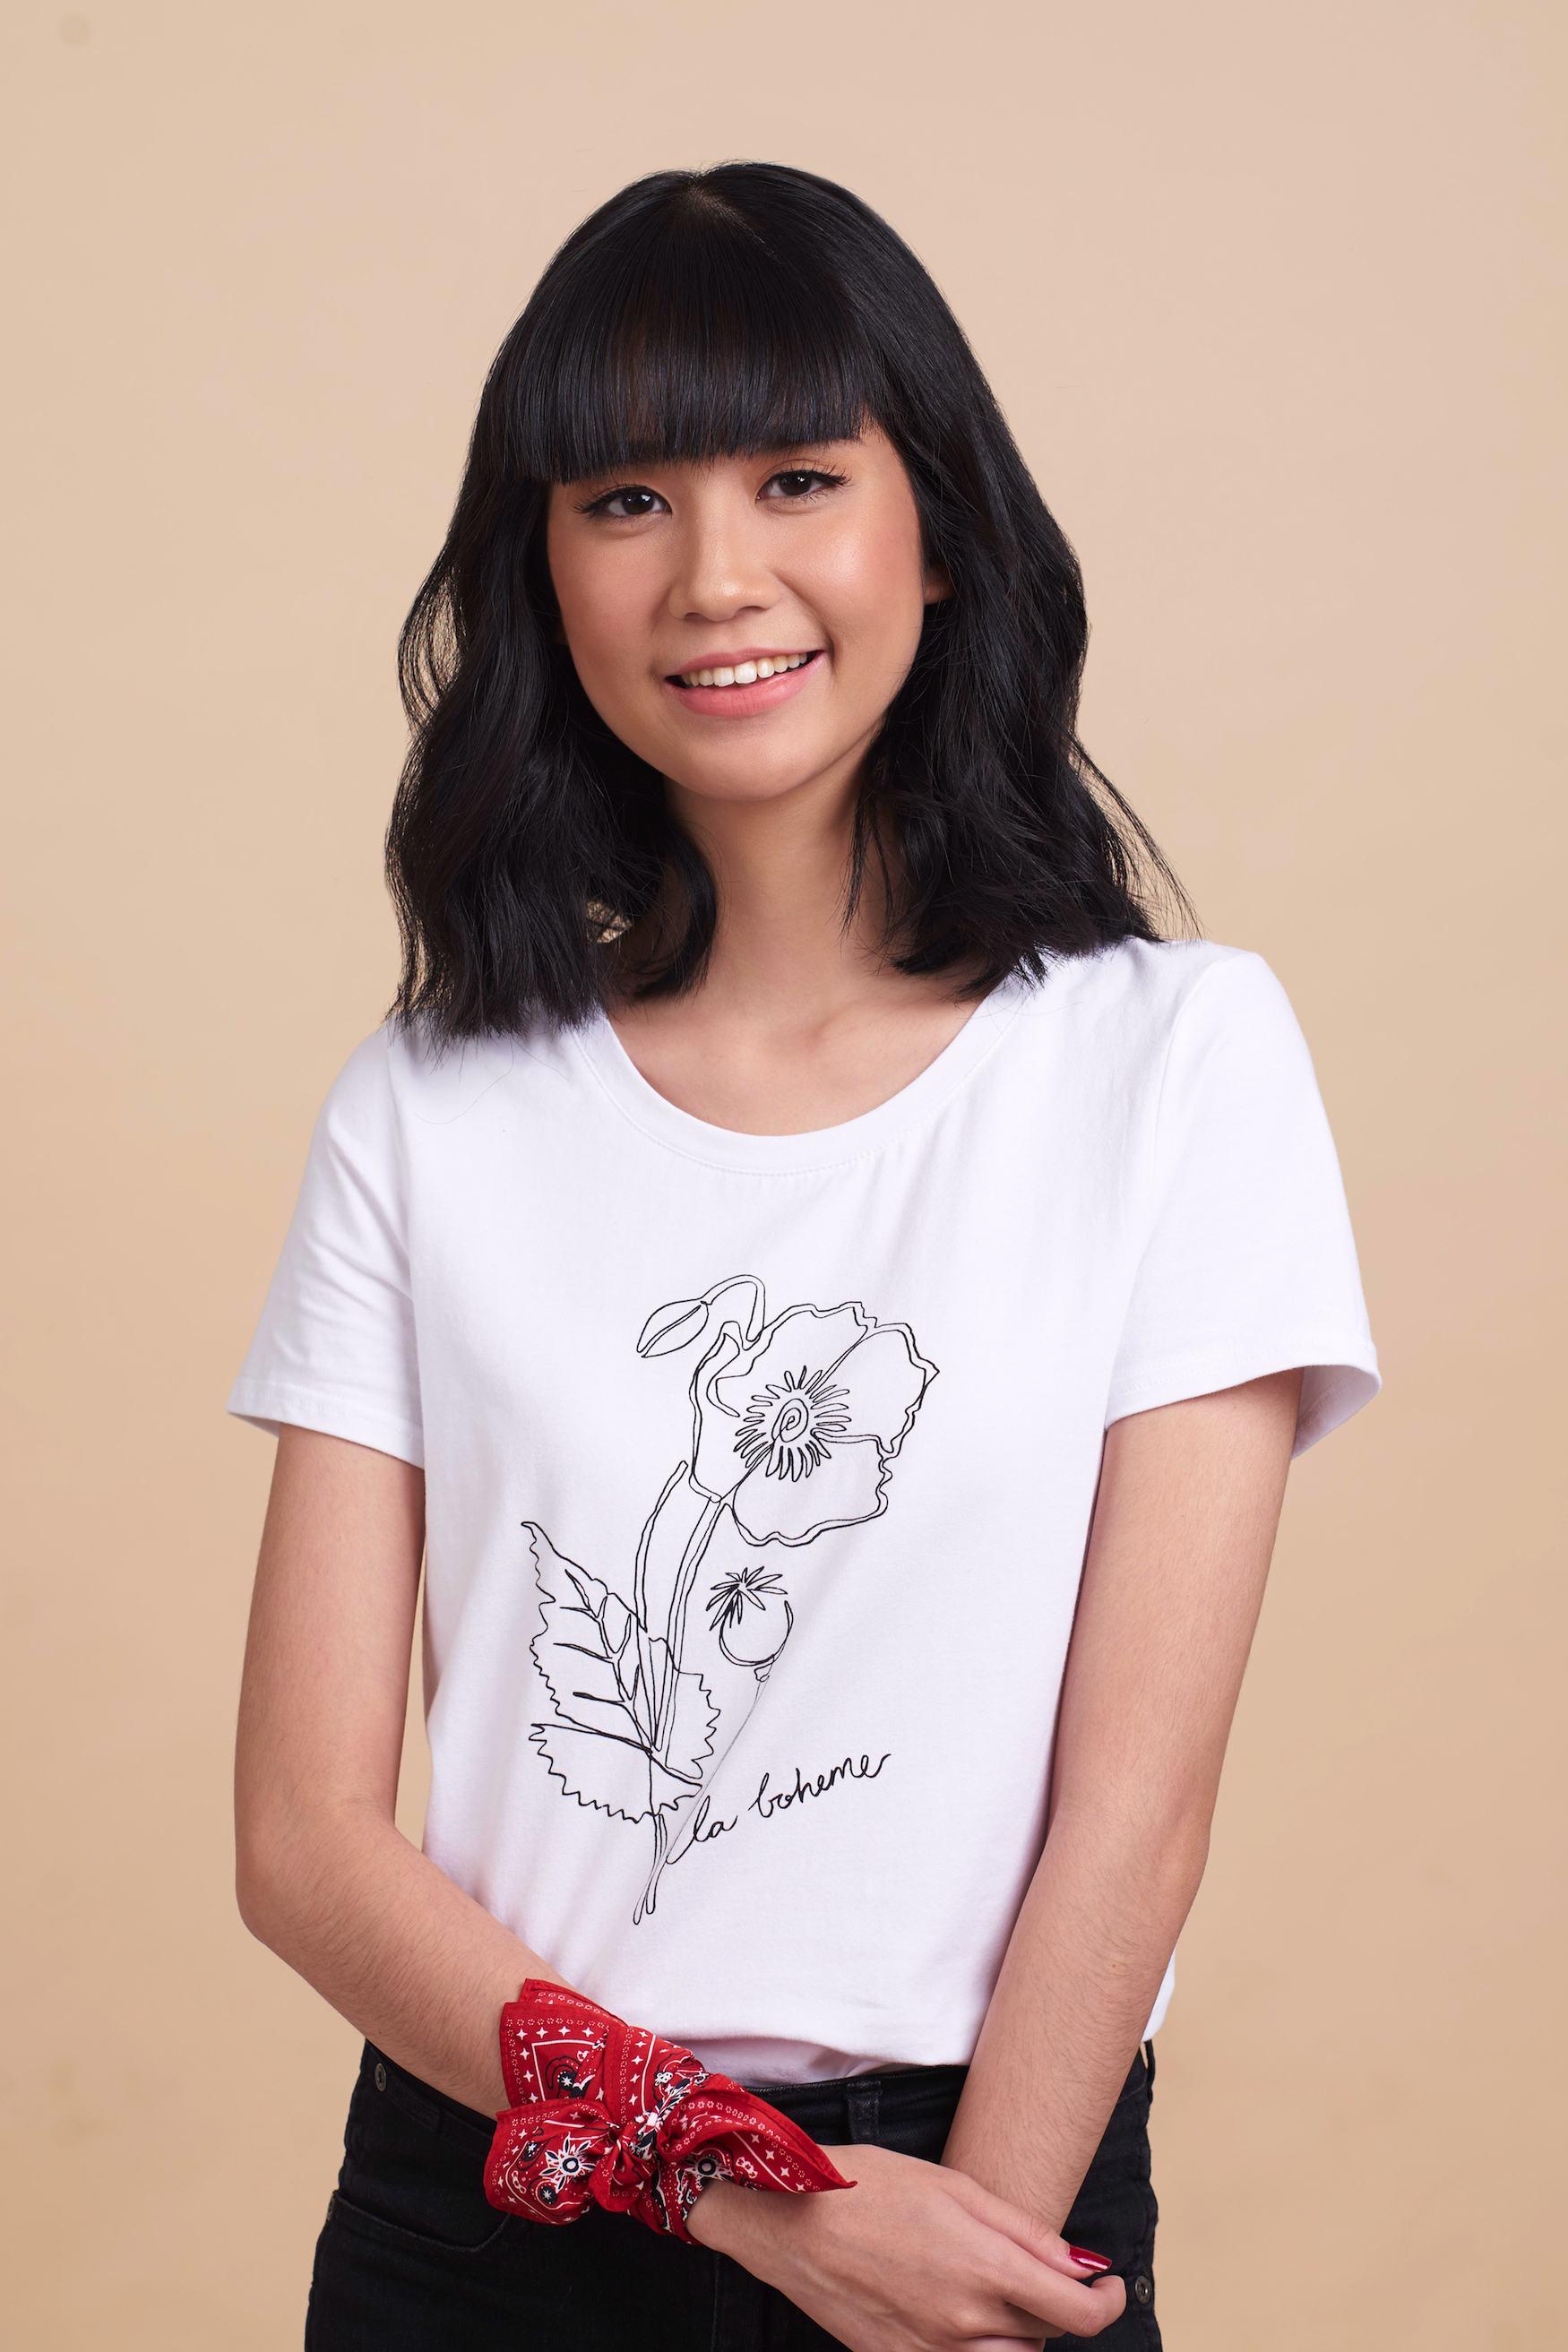 18 Model Rambut Pendek Sebahu Paling Dicari | All Things ...